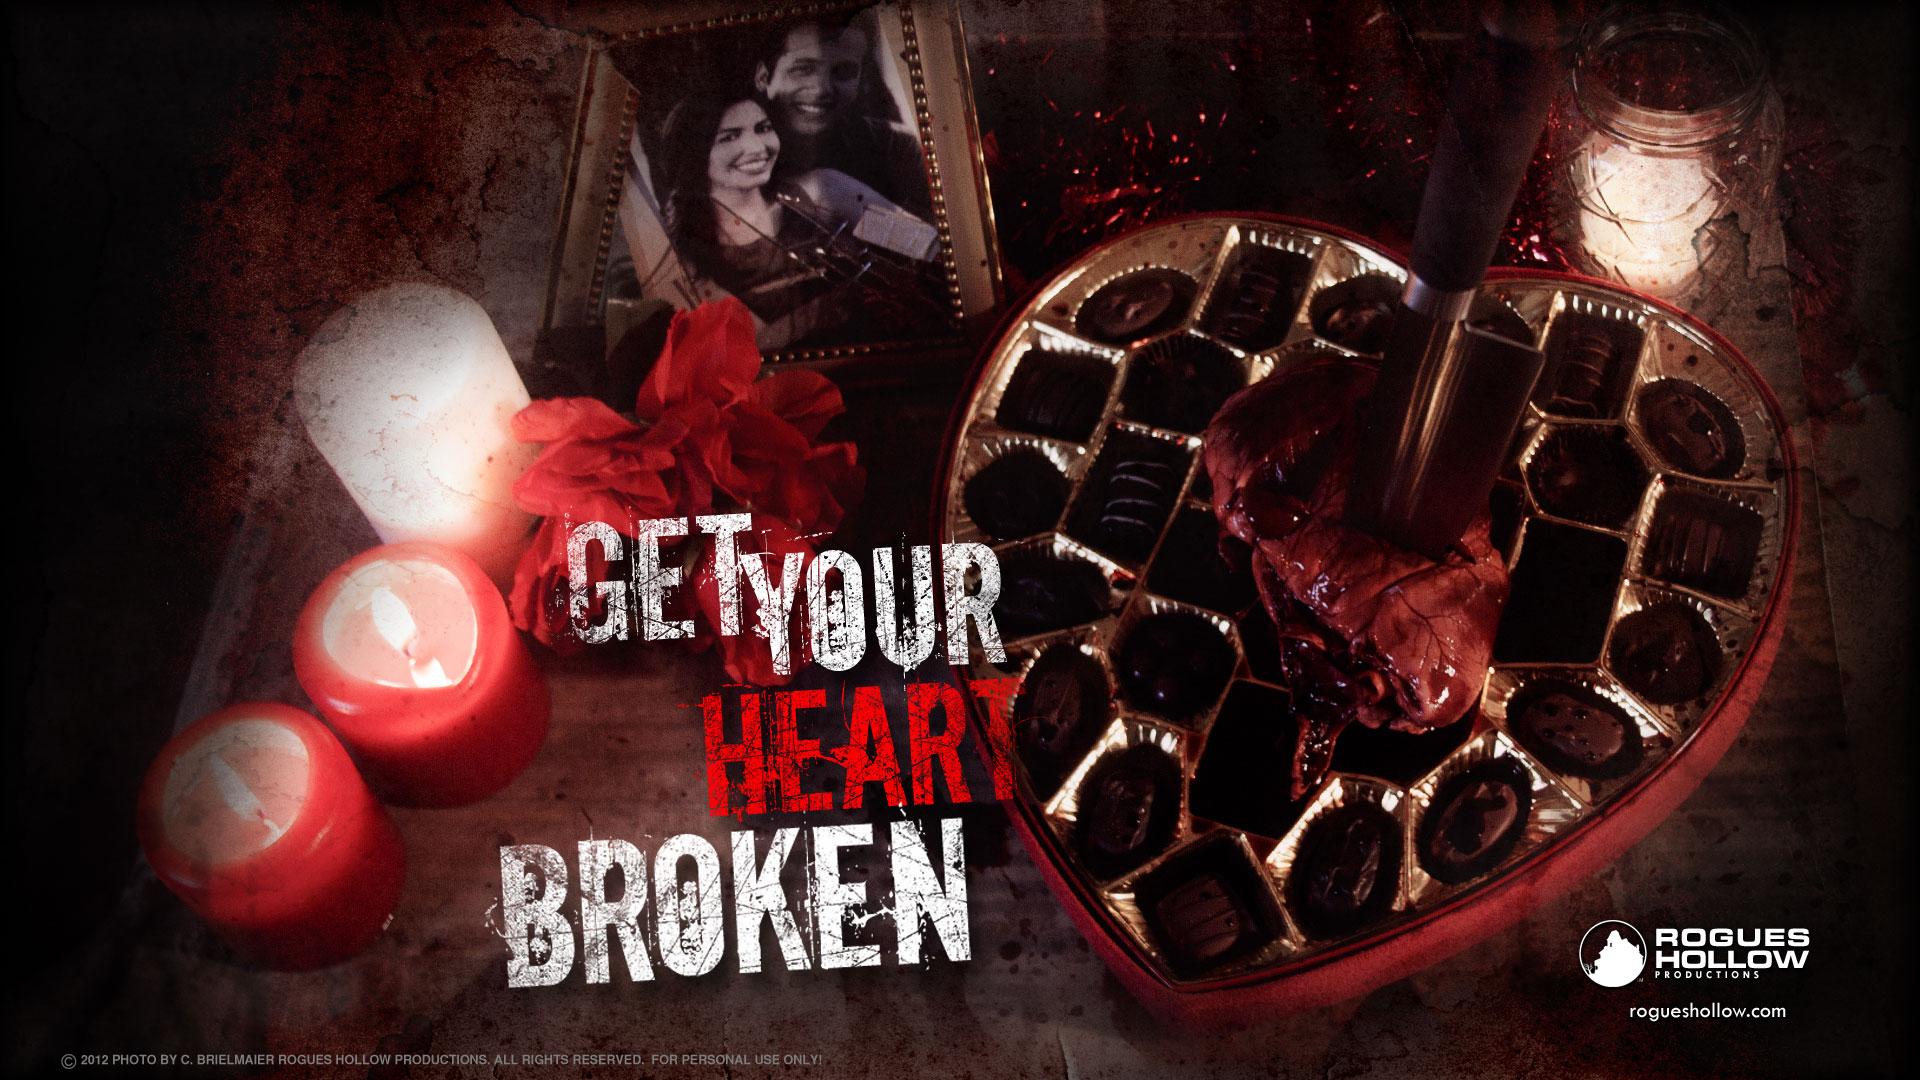 Valentineu0027s Day Horror Movie Short